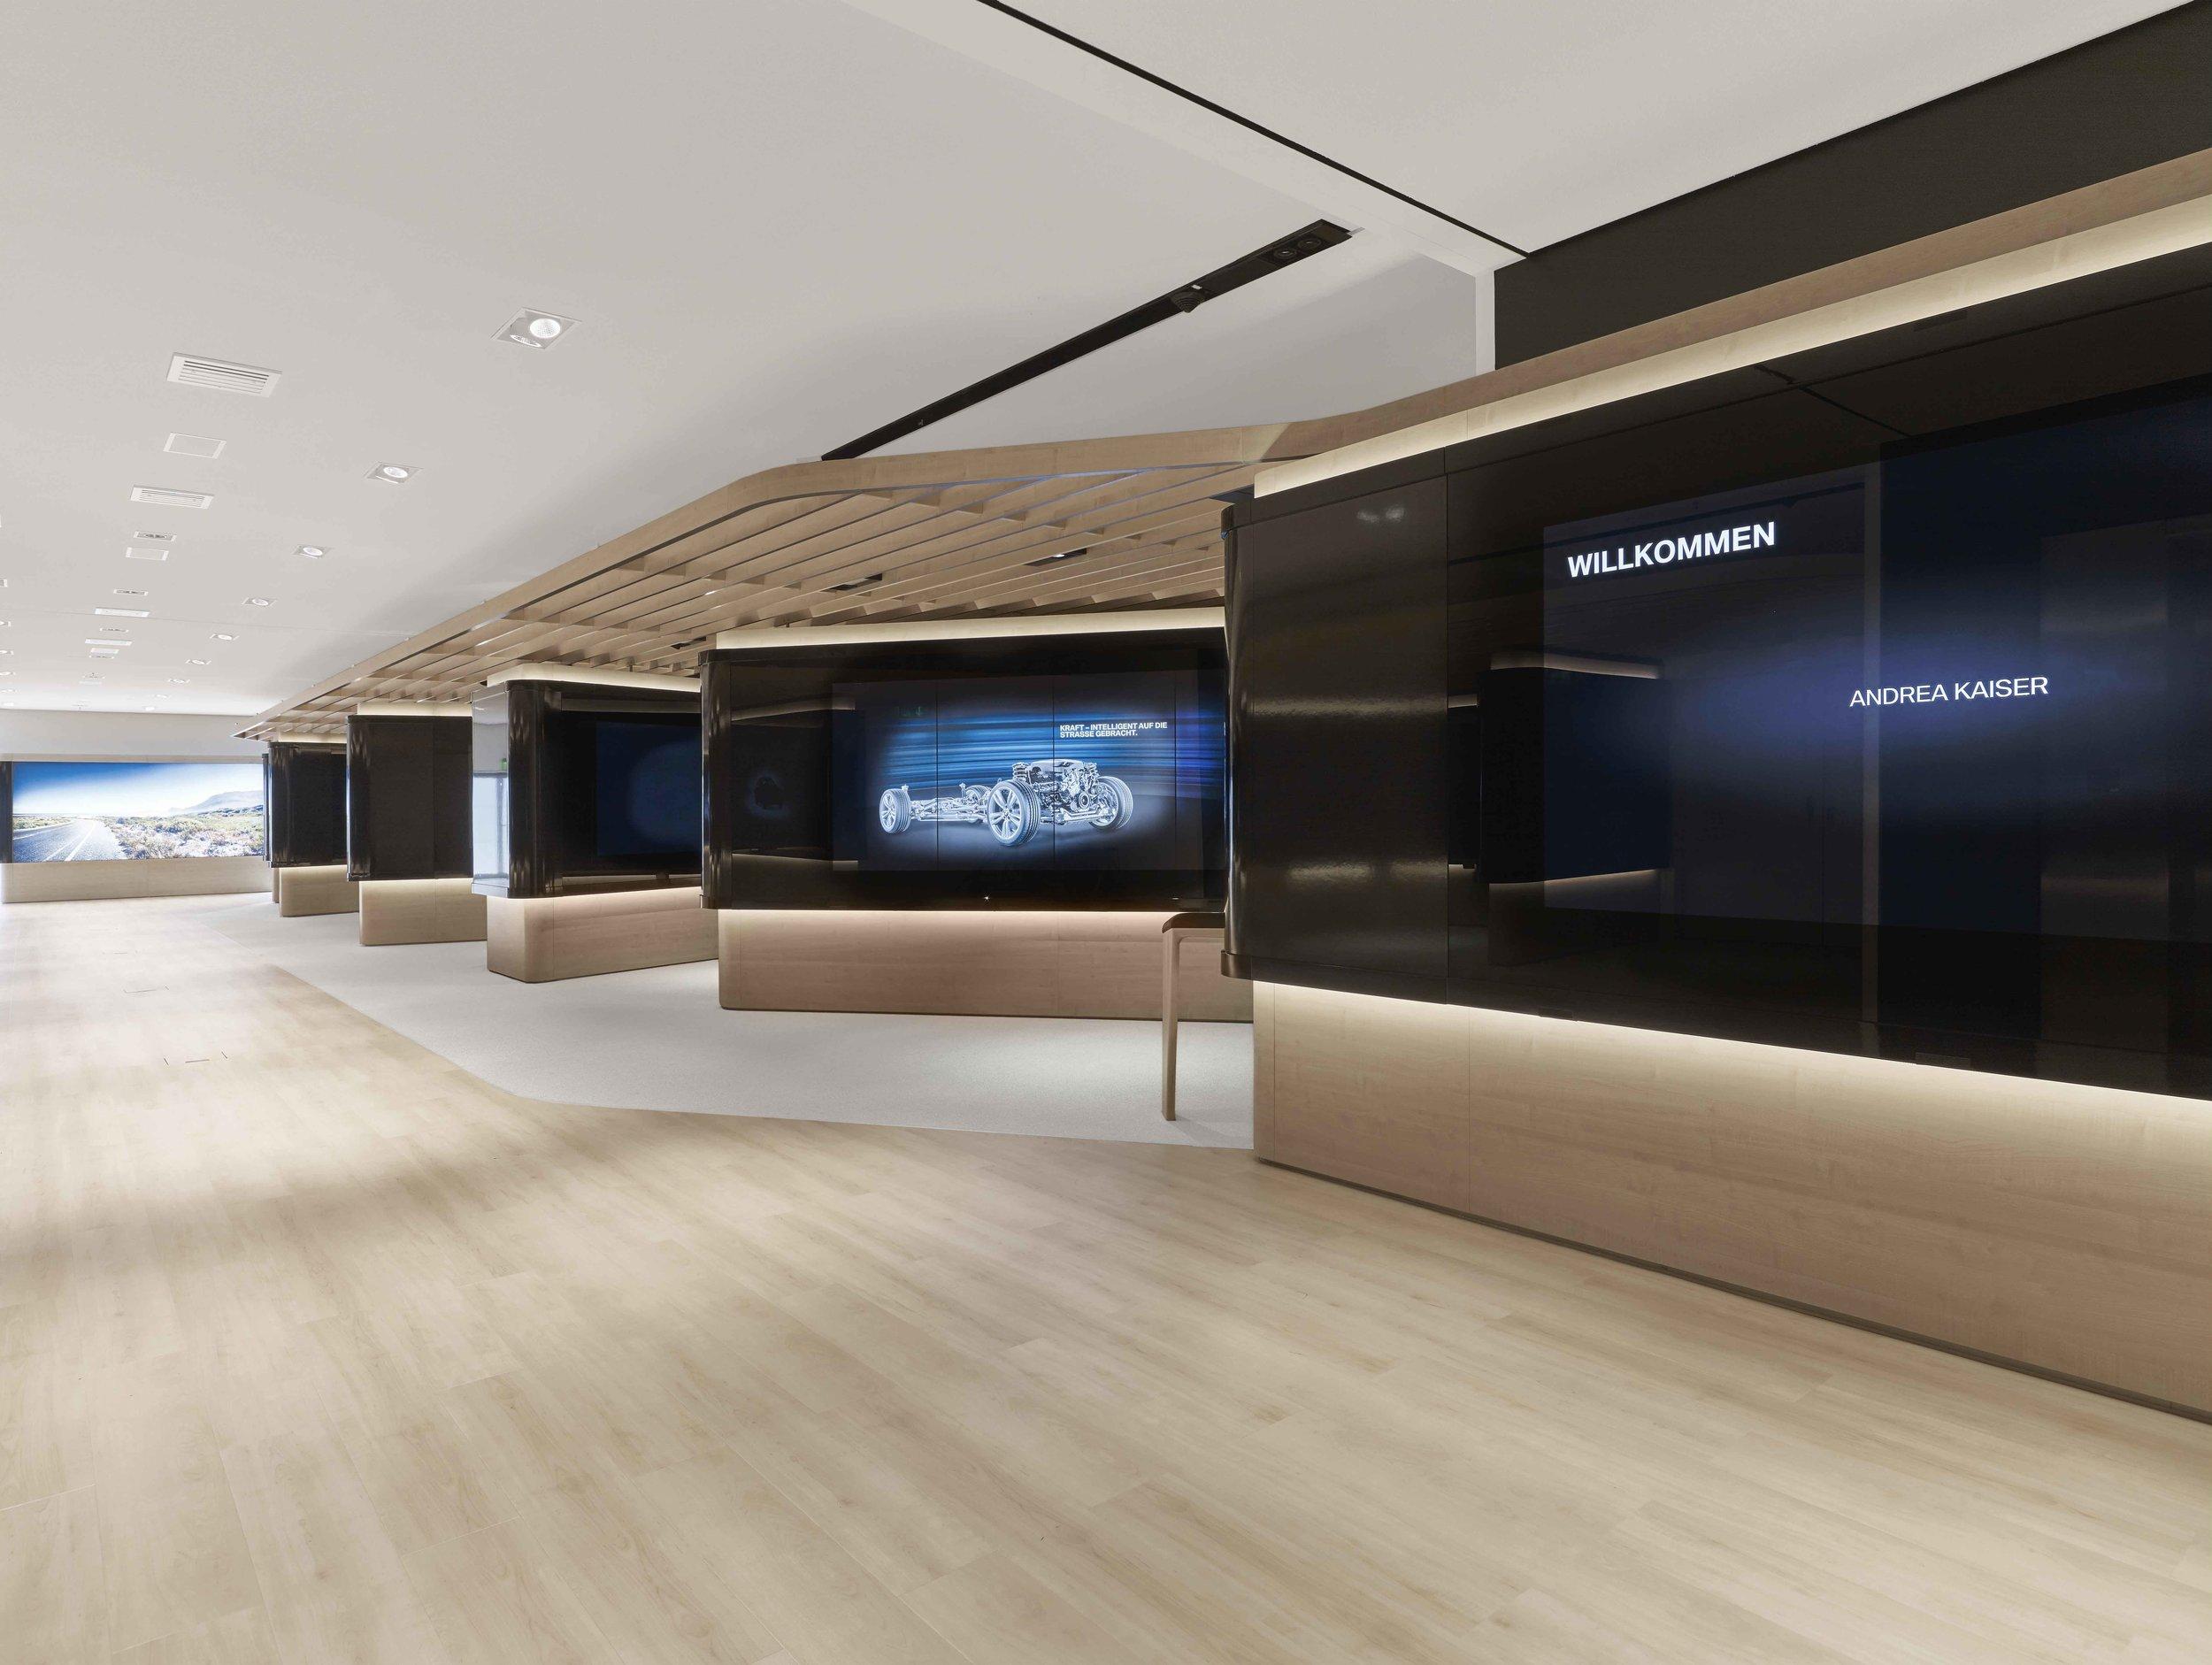 bmw-product-information-center_coorporate-interior-design_coordination-berlin_02.jpg